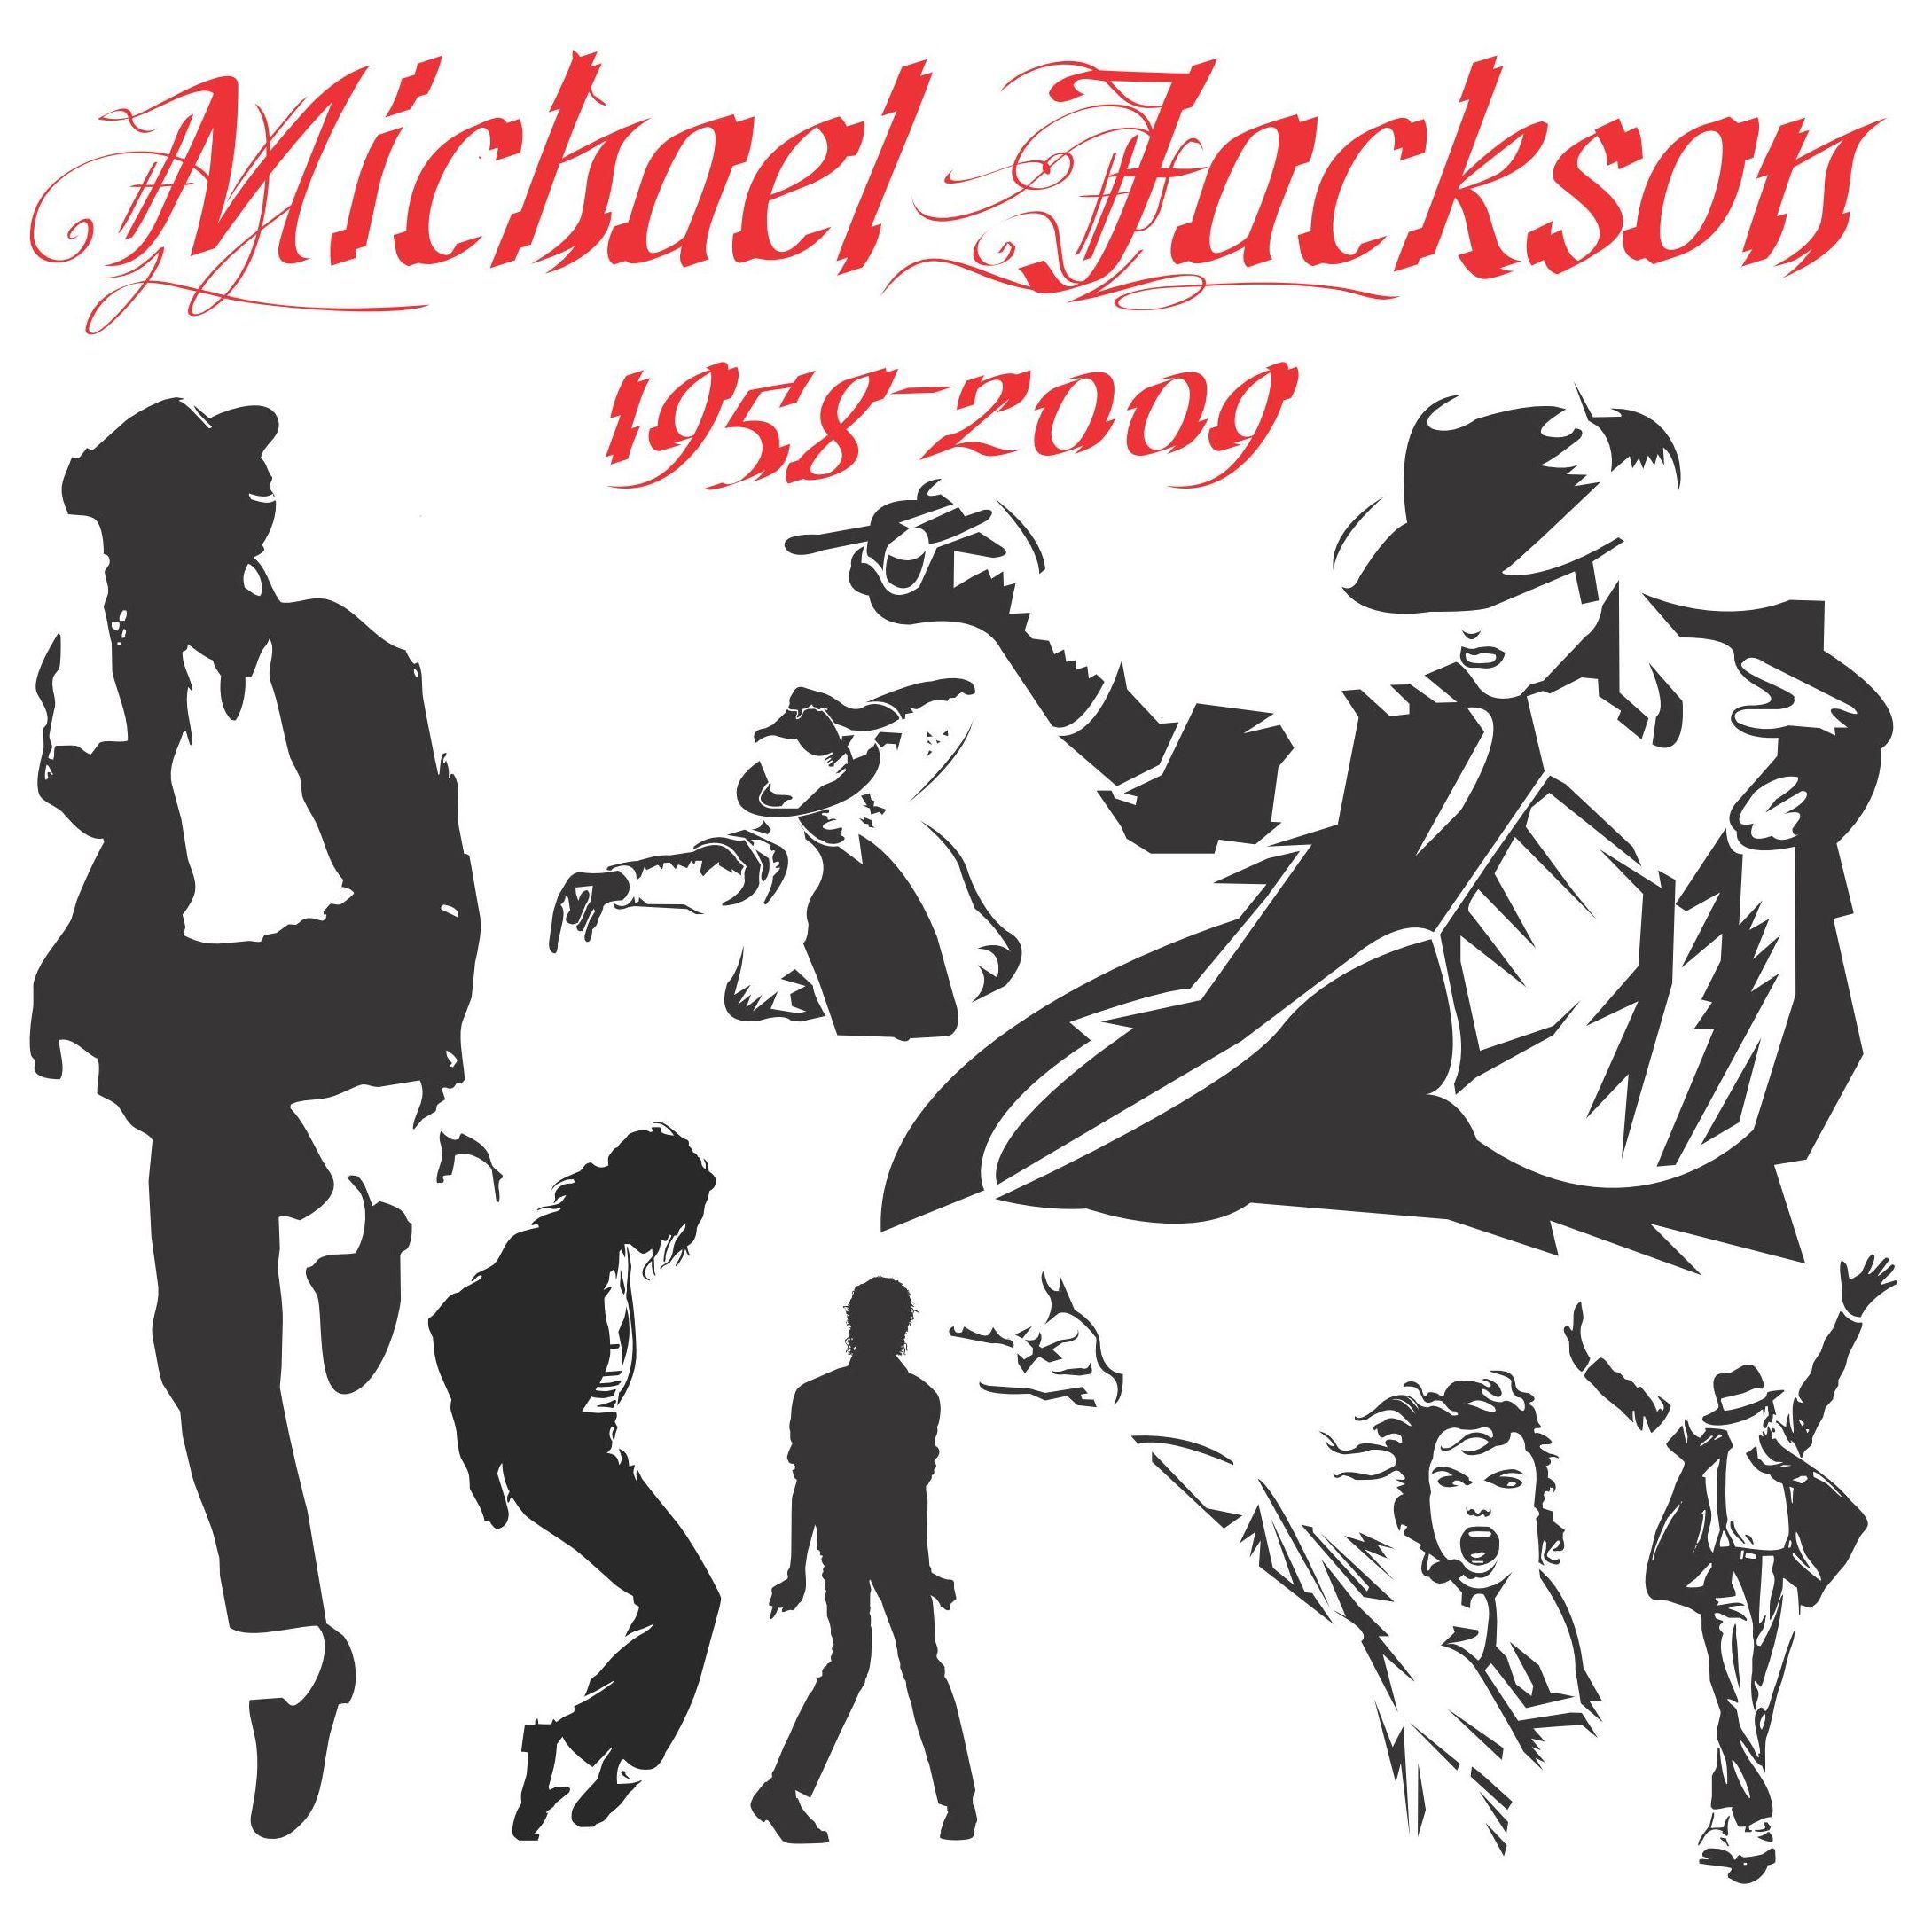 michael jackson silhouettes eps file